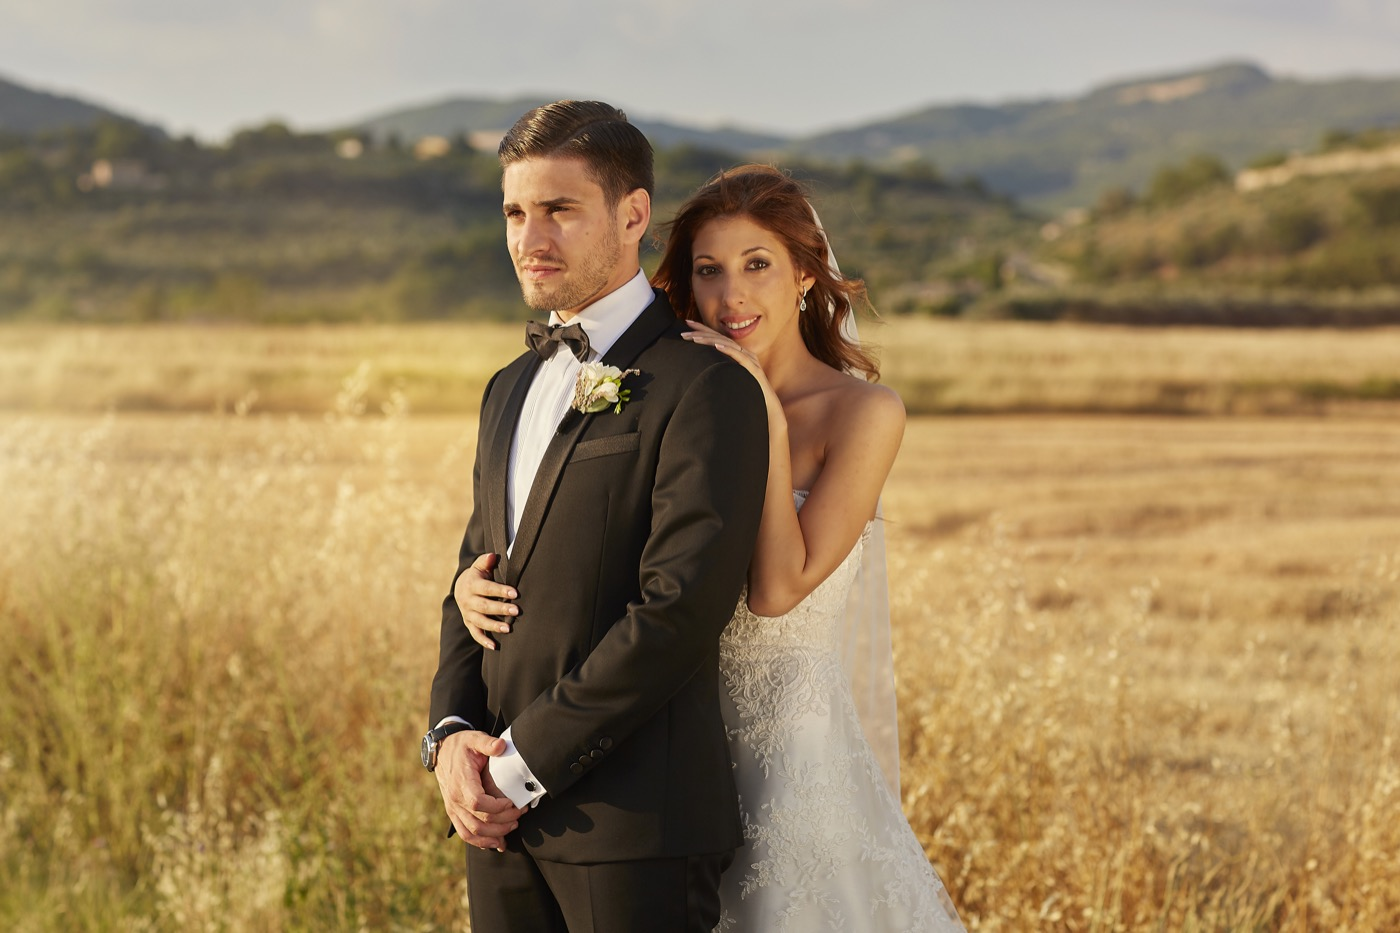 Claudio-Coppola-wedding-photographer-abbazia-7-frati-piegaro-62